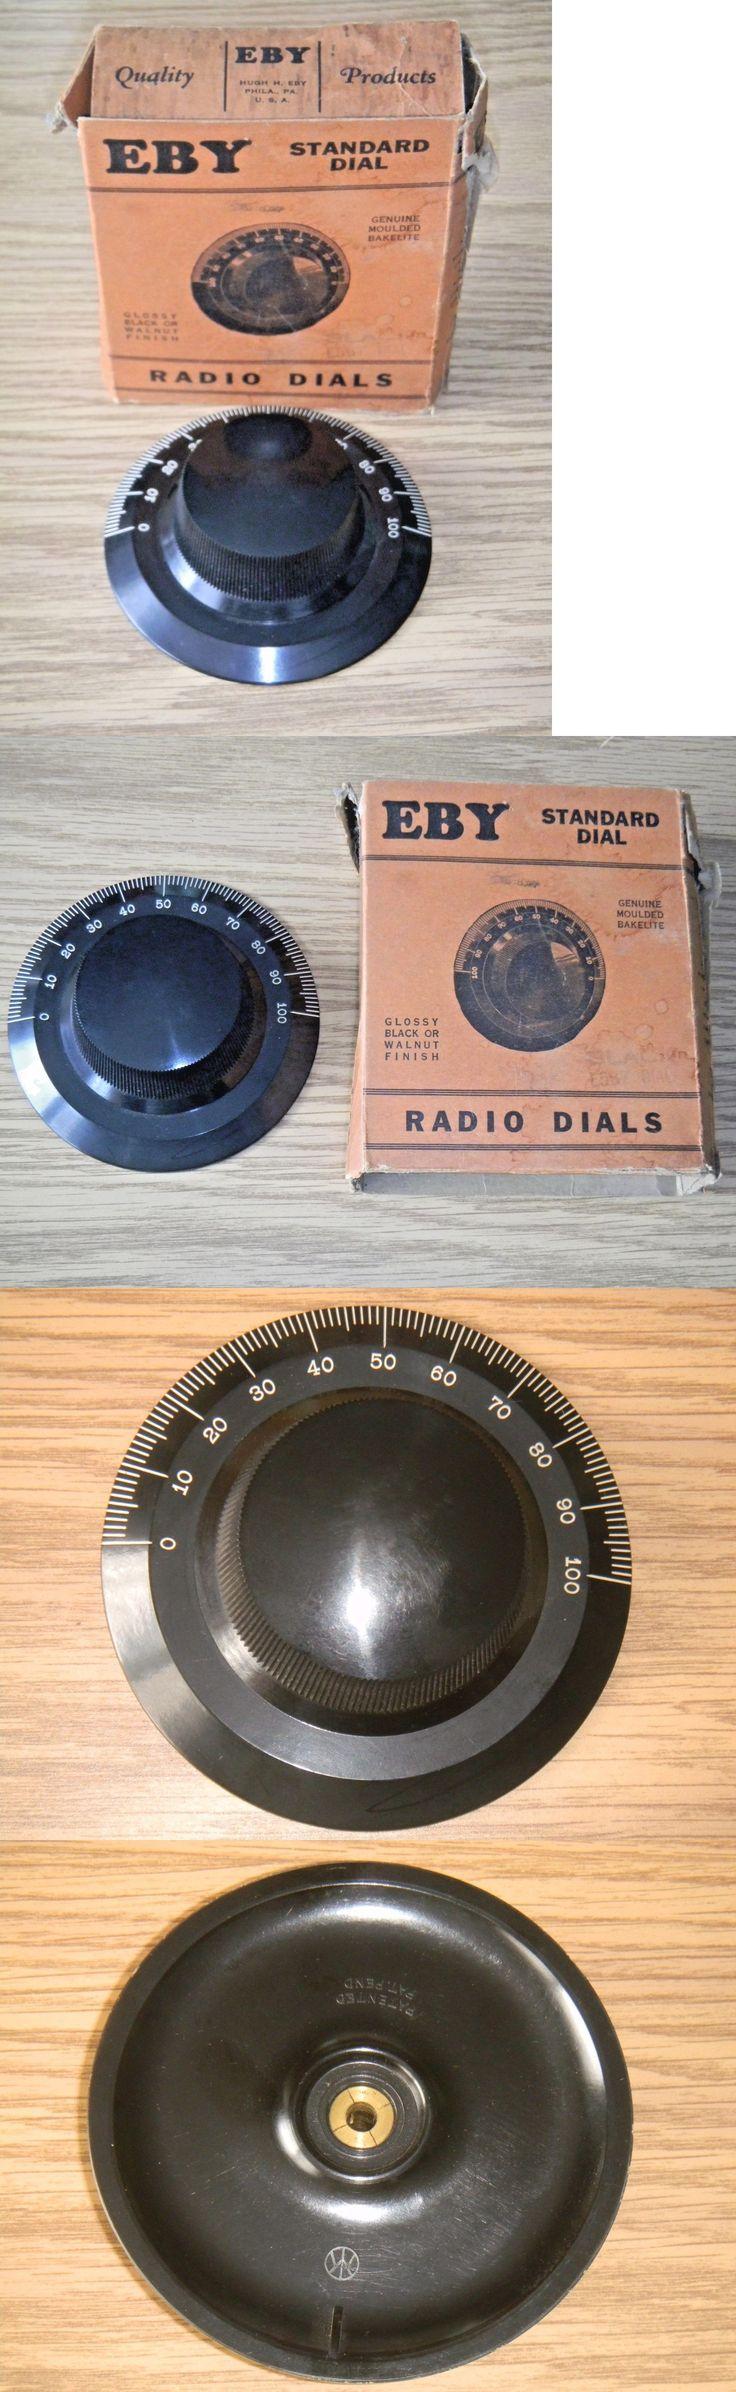 Vintage Radios: Vintage Eby E567 Radio Dial Knob Moulded Bakelite -> BUY IT NOW ONLY: $49.99 on eBay!